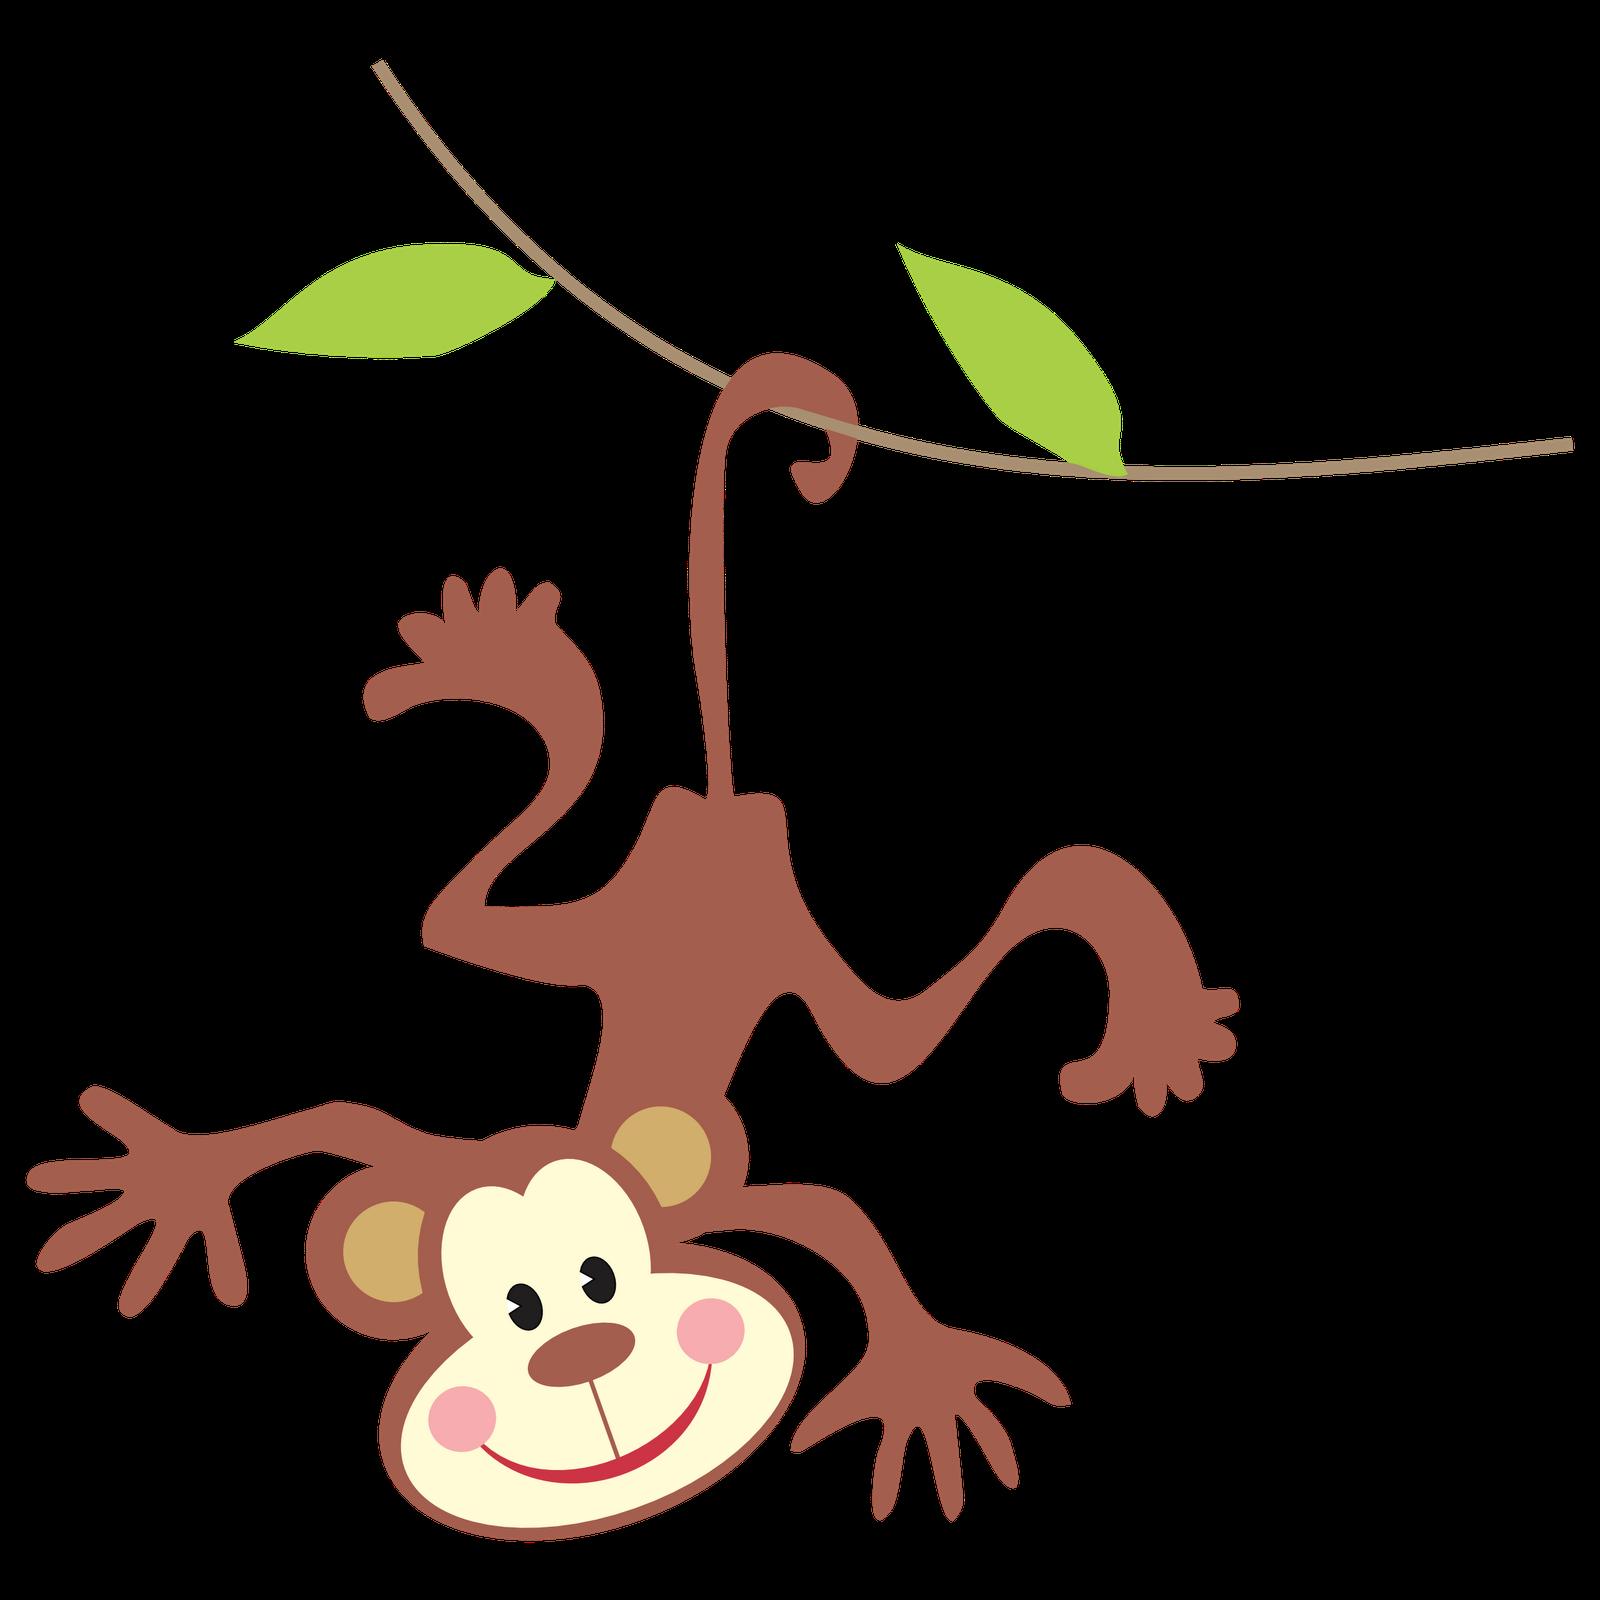 Monkey on vine clipart.